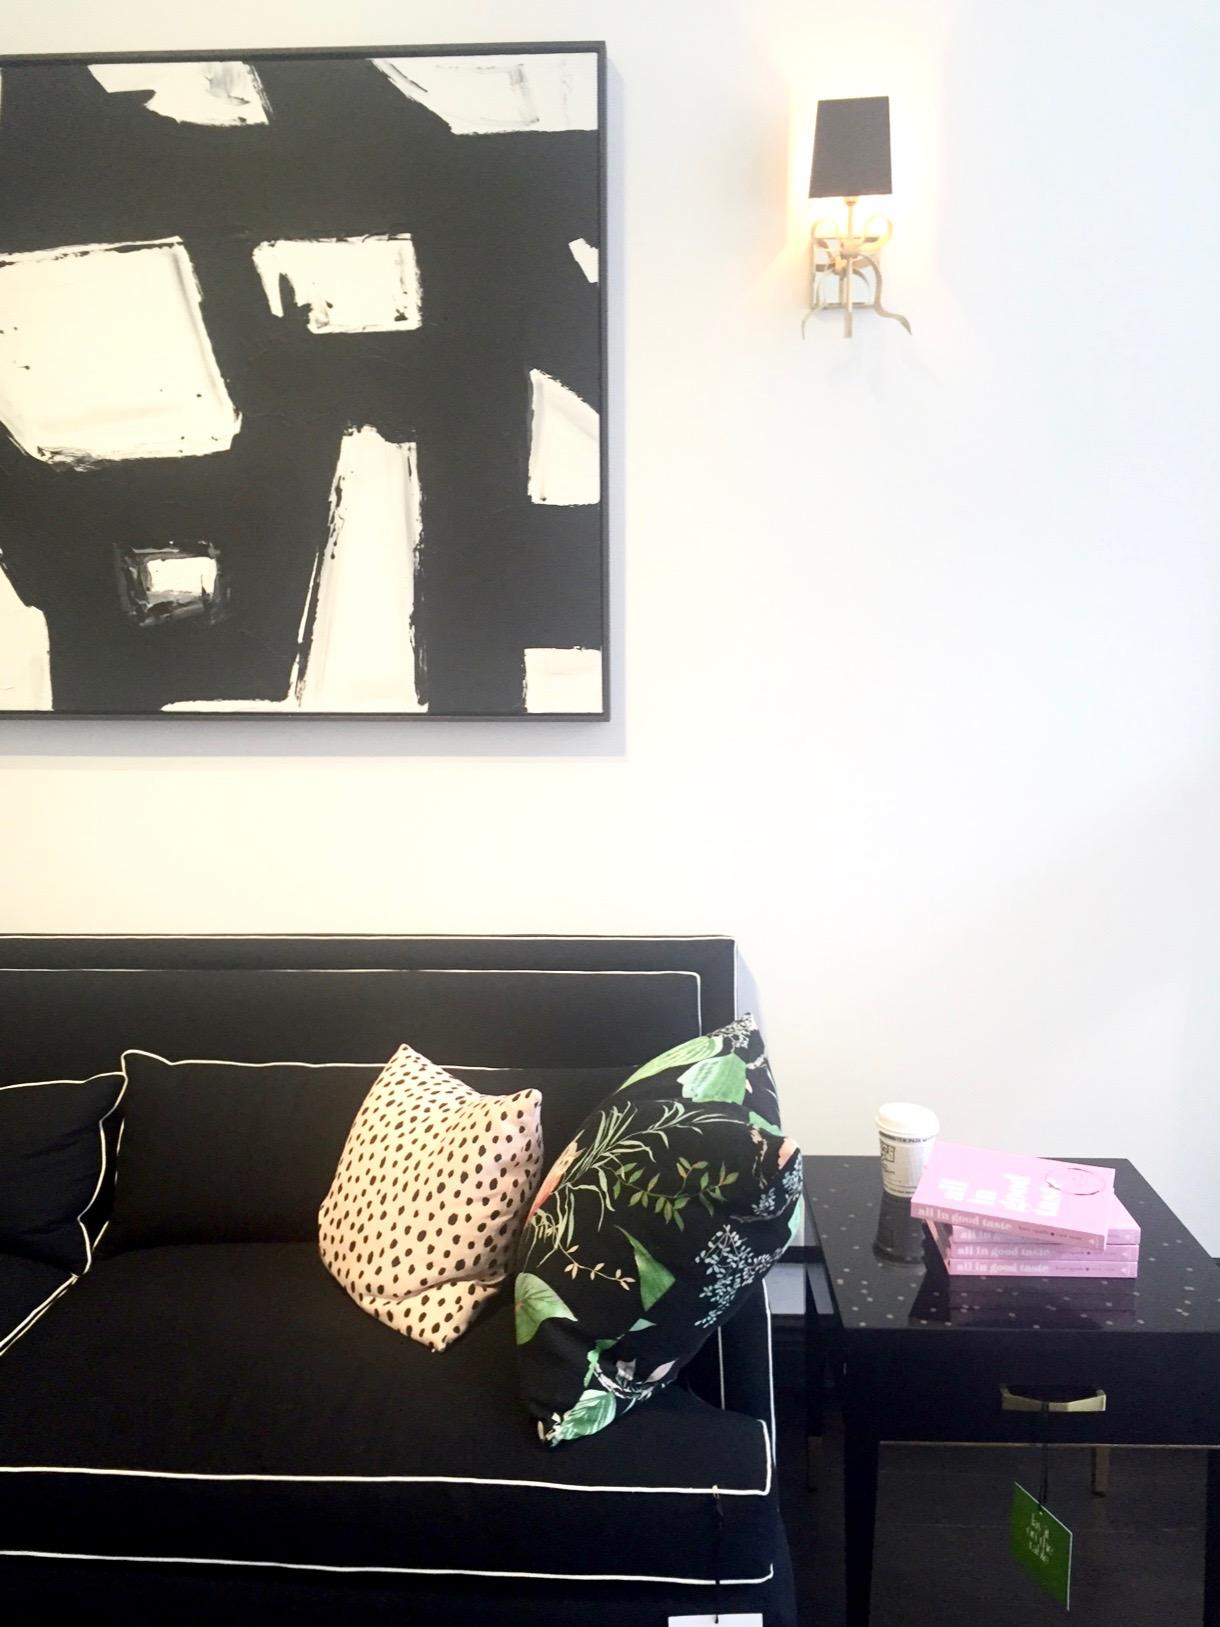 Anna Osgoodby Life + Design :: Kate Spade Home Pop-Up Shop